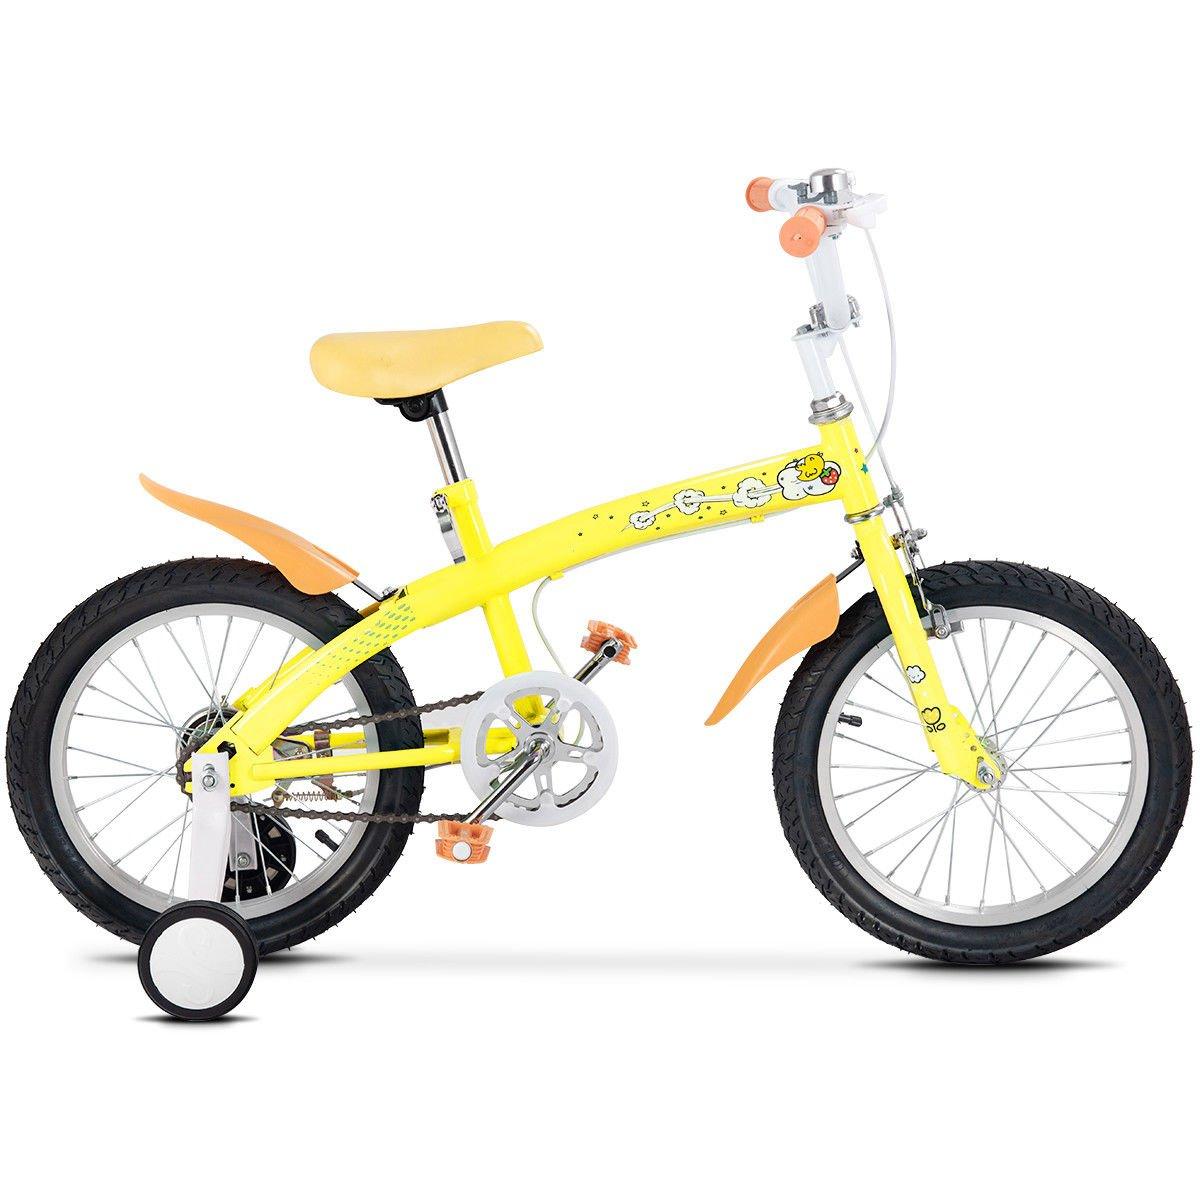 FDInspiration Yellow 45'' x 31.5'' Metal Frame Kids Bike w/Training Wheels with Ebook by FDInspiration (Image #4)